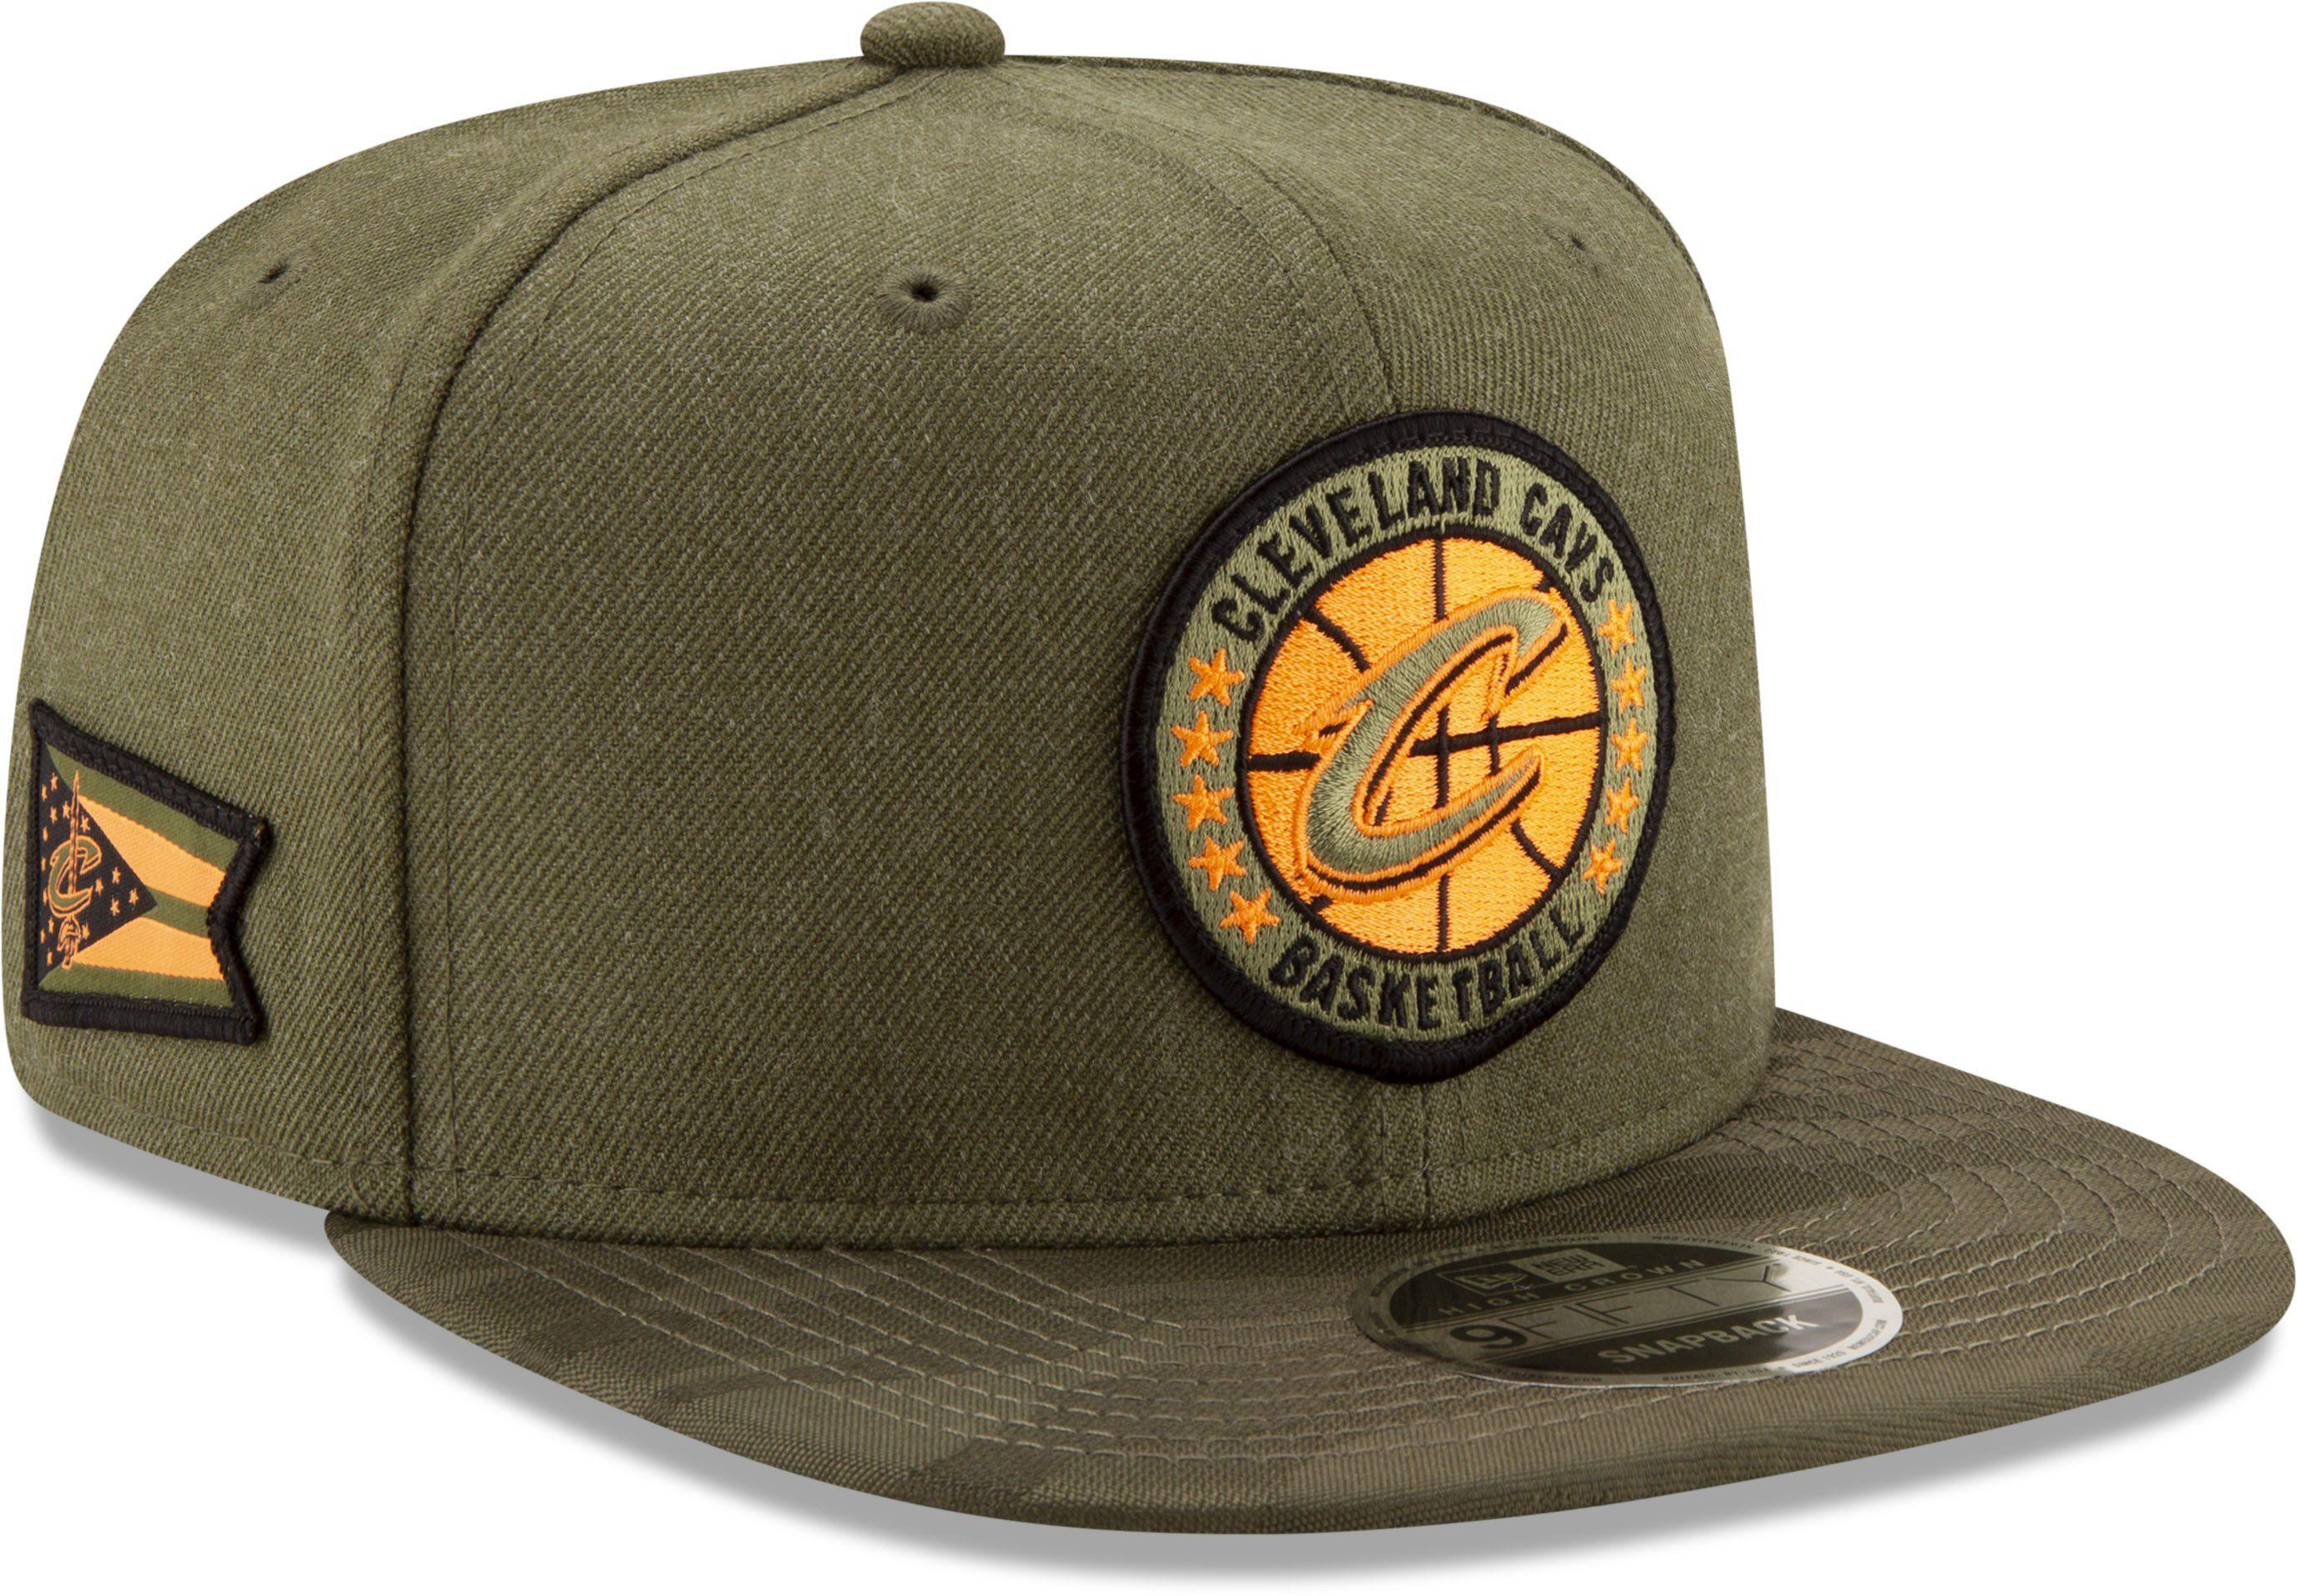 23fbb8dd4b1b5e Cleveland Cavaliers NBA 2018 Tip Off Series New Era 950 Snapback Cap –  lovemycap